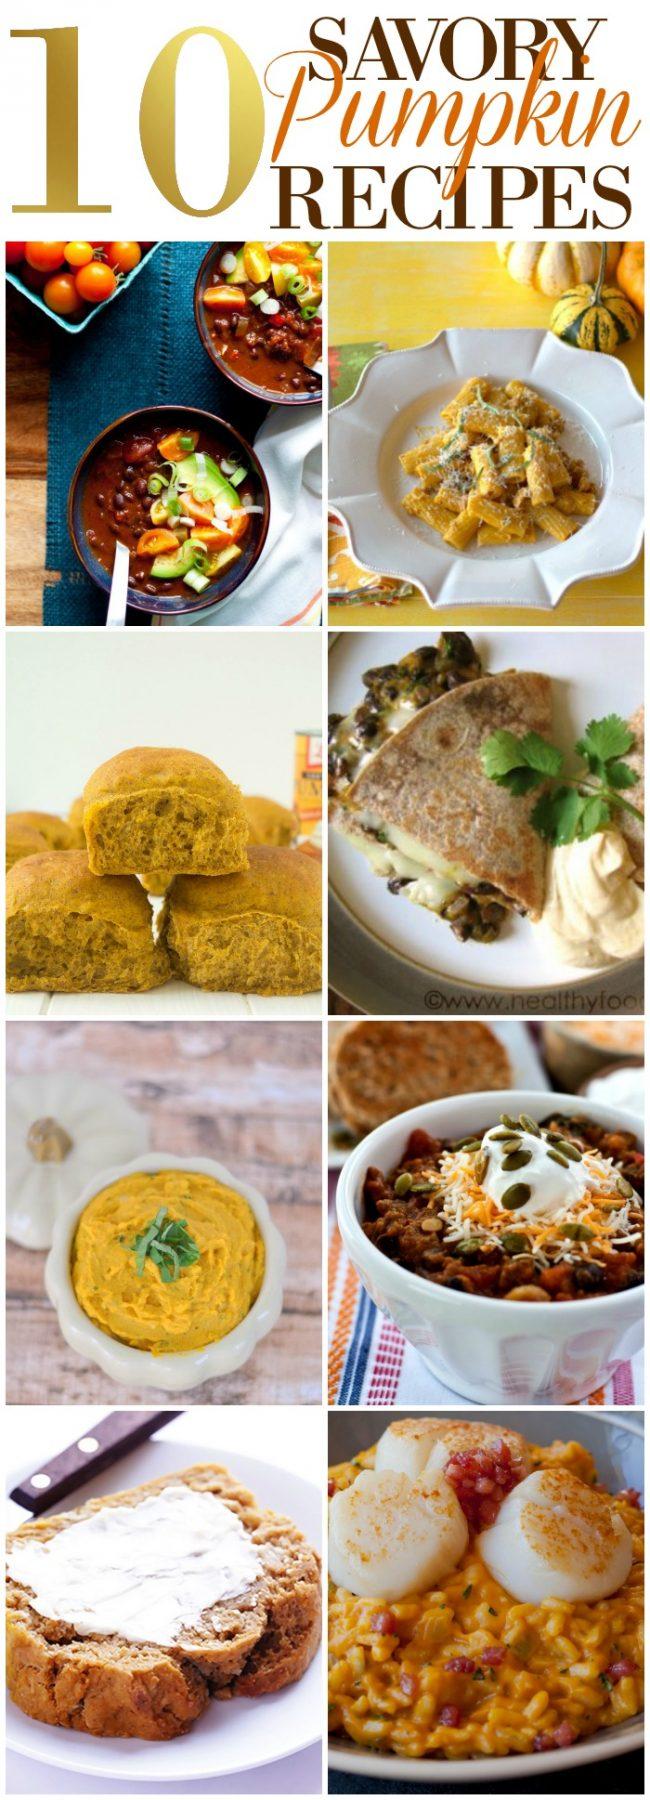 10 Savory Pumpkin Recipes